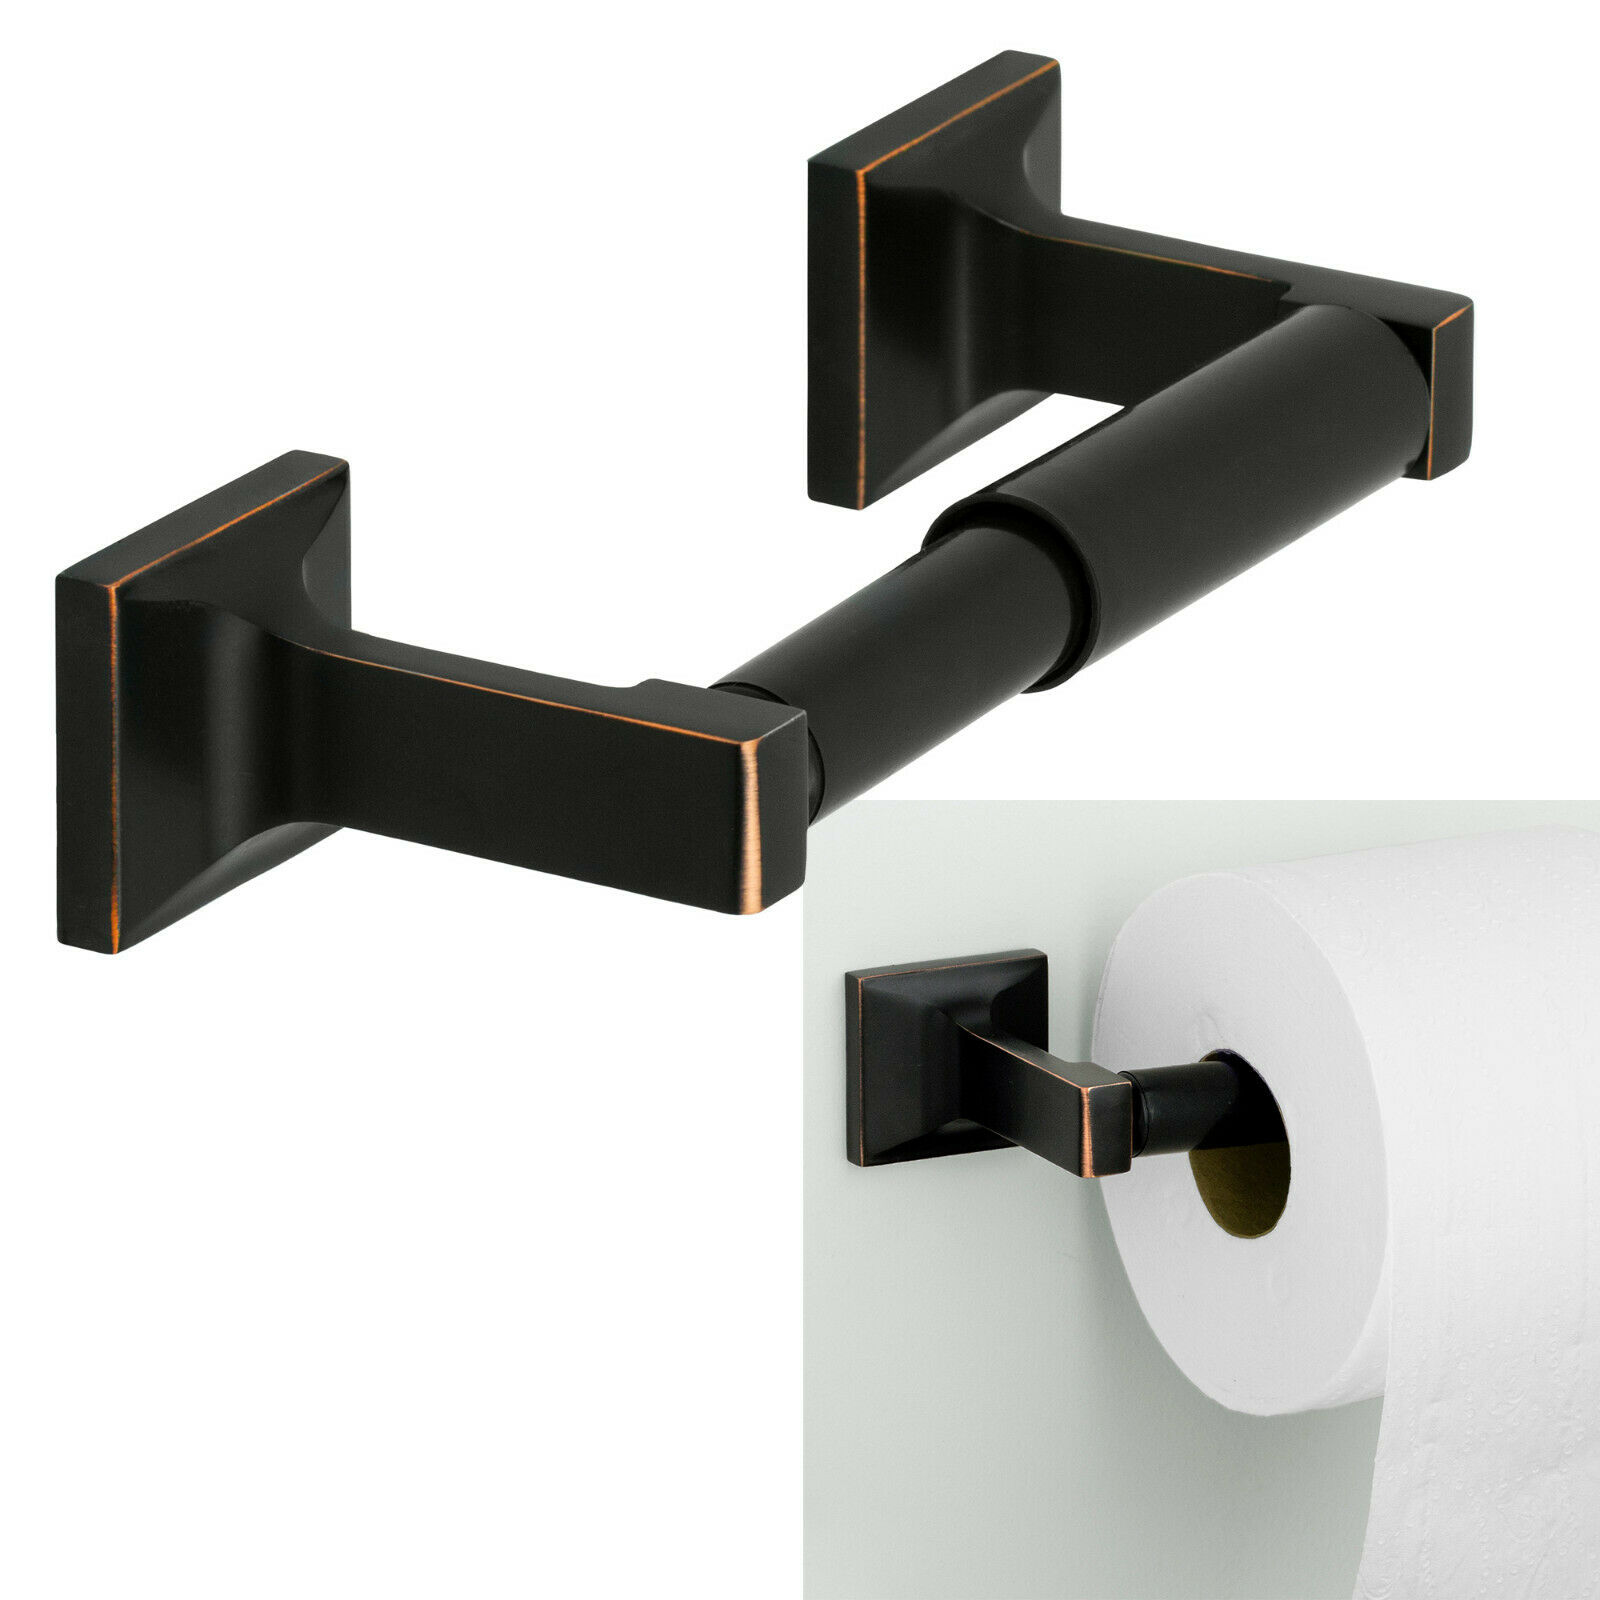 Redwood Toilet Tissue Paper Holder Bath Hardware Accessory, Oil Rubbed Bronze Bath